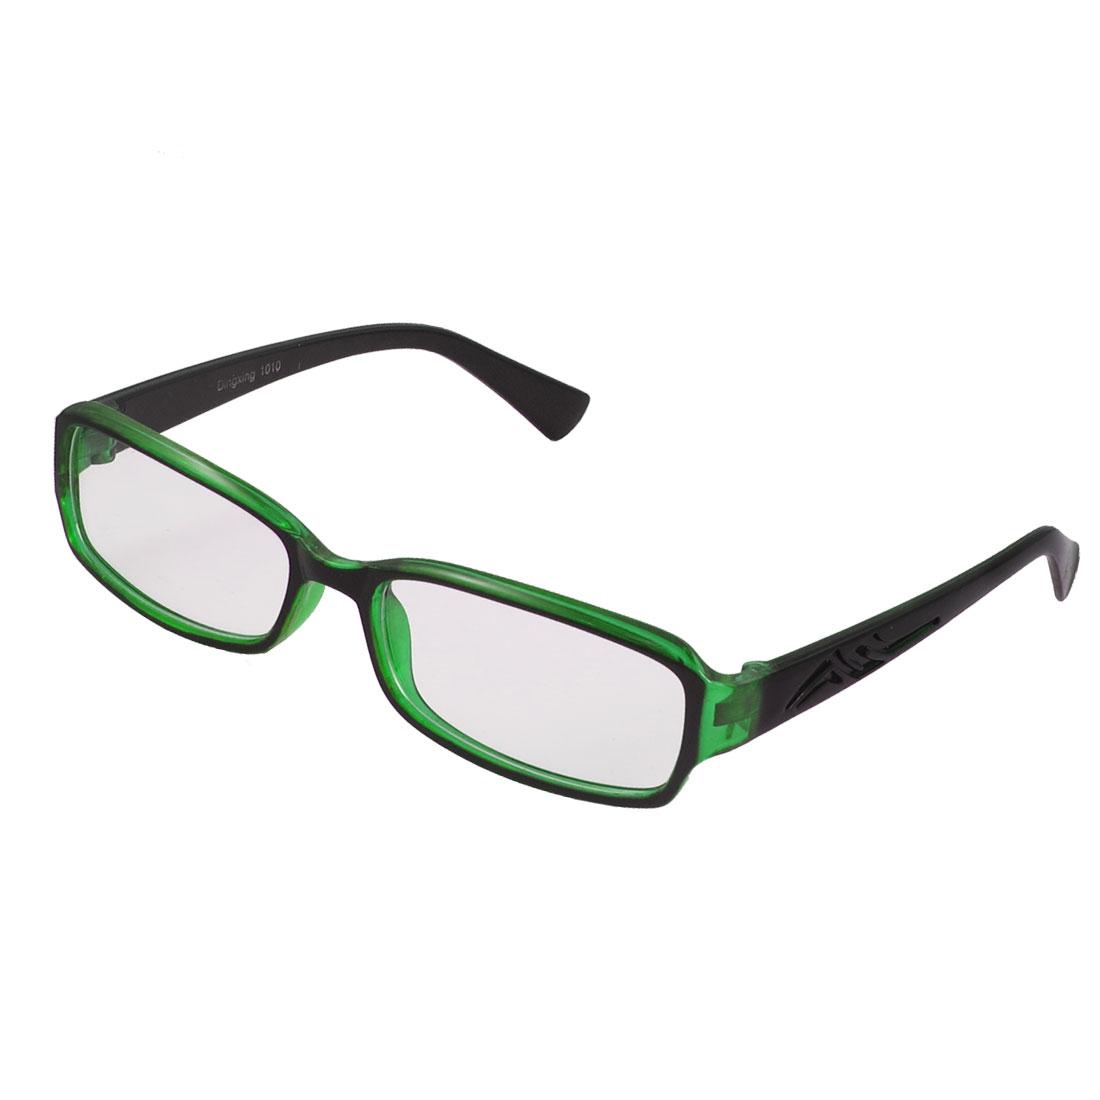 Lady Green Full Frame Carved Arm Plain Plano Eyeglass